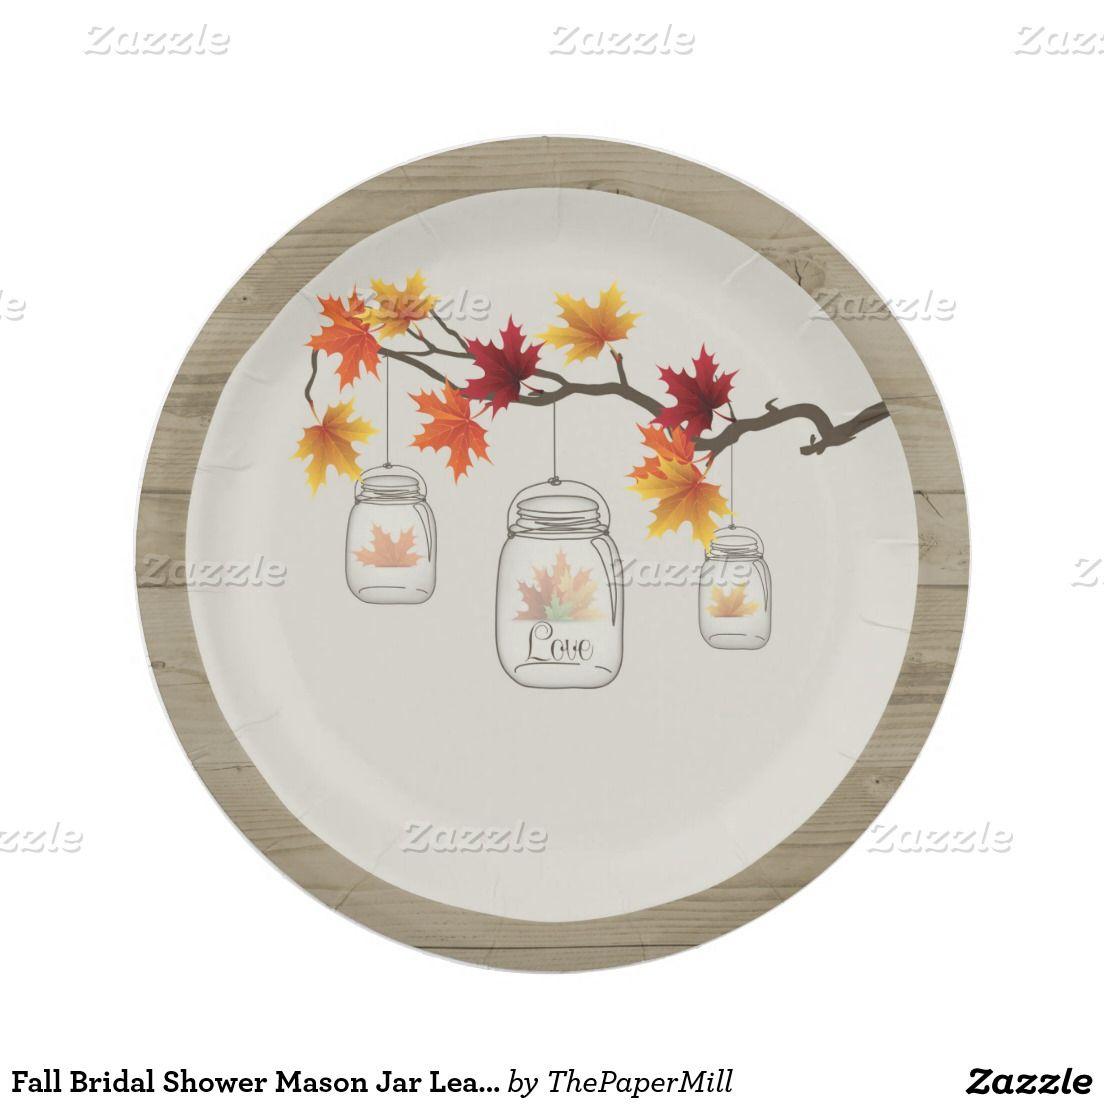 Fall Bridal Shower Mason Jar Leaves Paper Plates